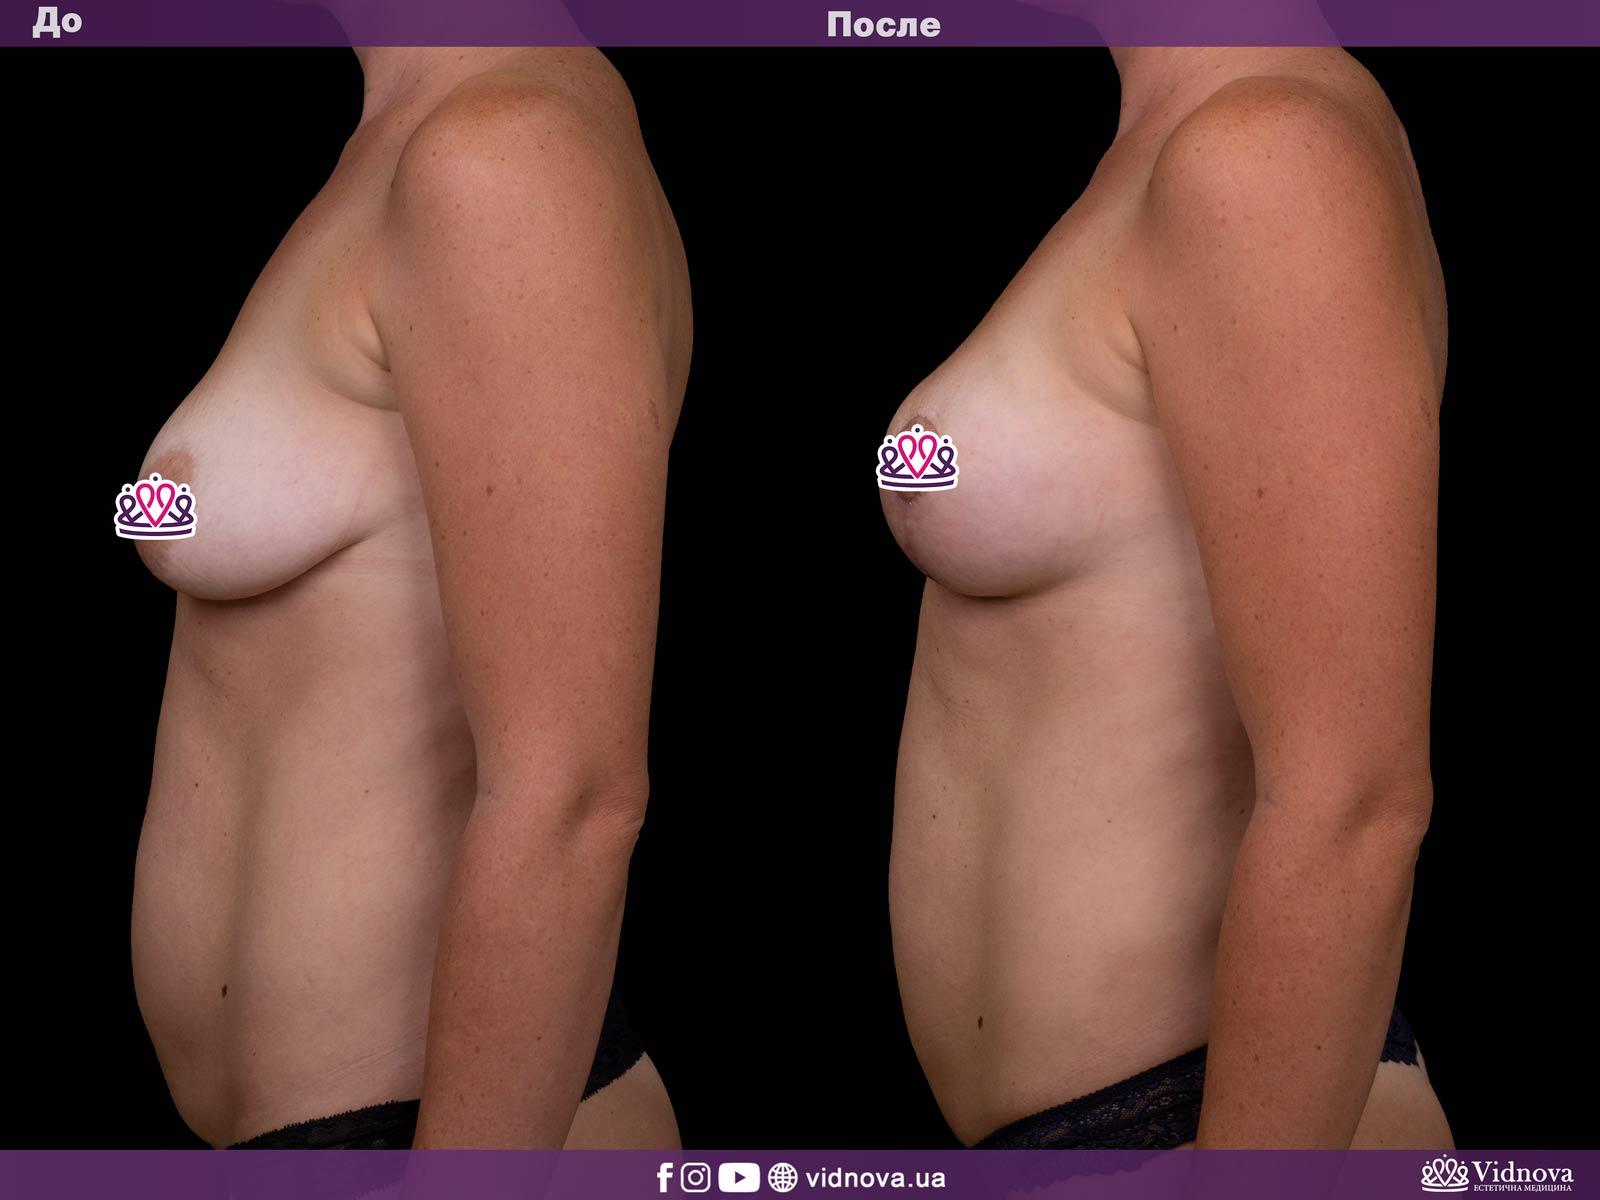 Подтяжка груди: Фото ДО и ПОСЛЕ - Пример №12-3 - Клиника Vidnova